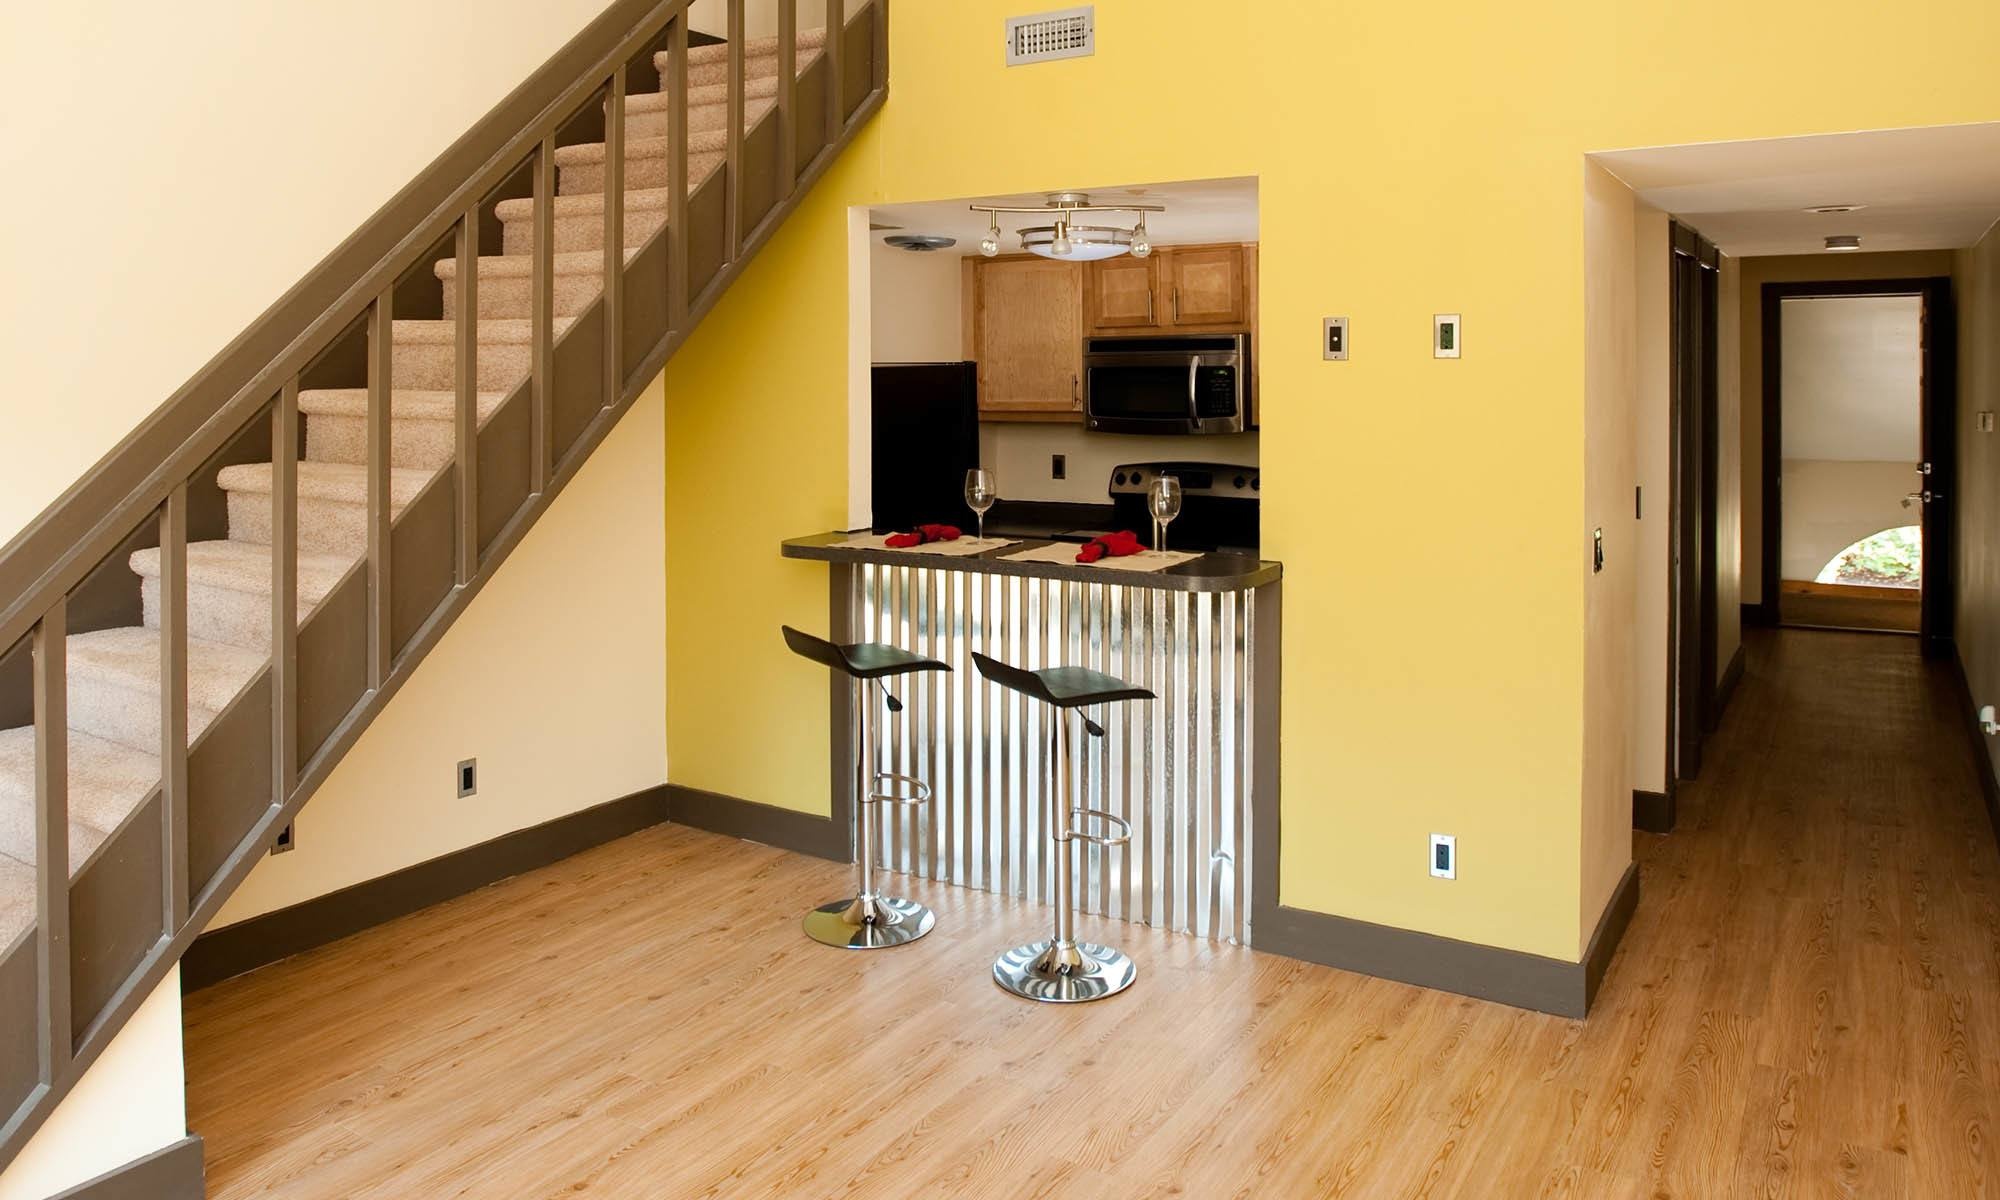 Apartments in Lexington, KY